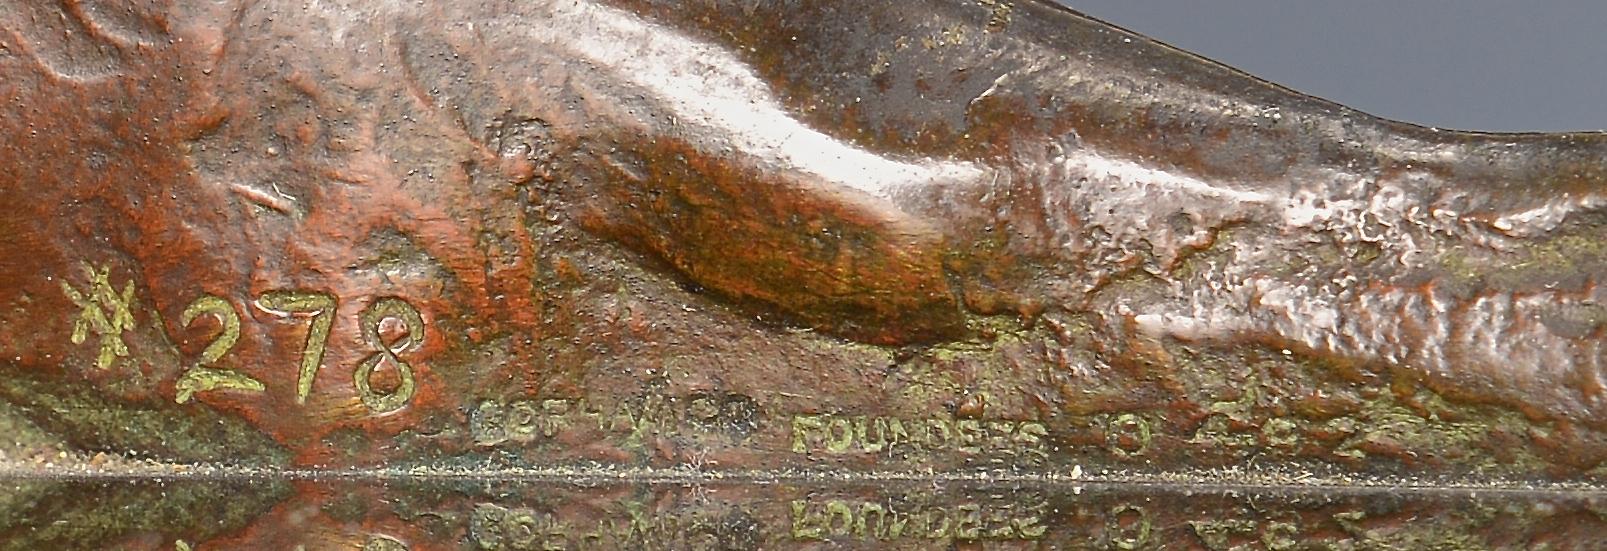 Lot 167: Anna Hyatt Huntington Bronze Tiger or Panther